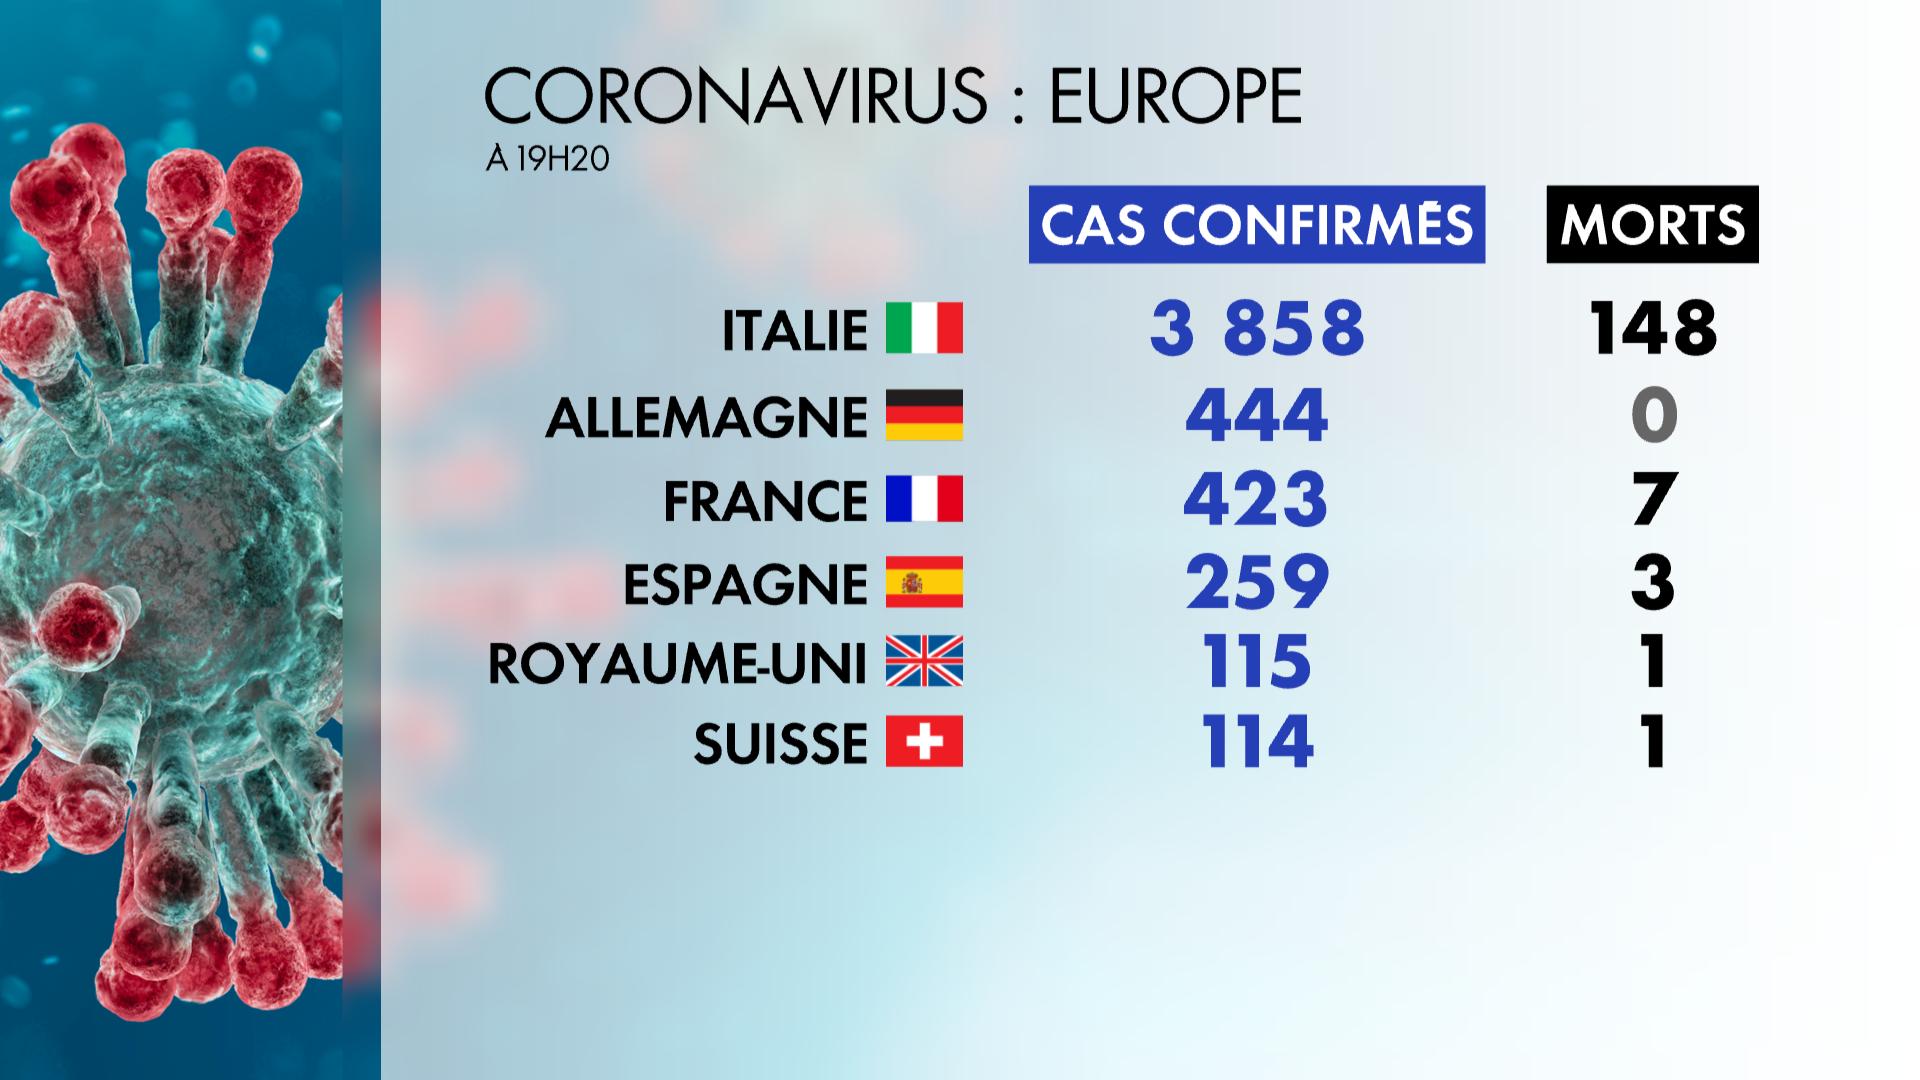 europe_bilan_coronavirus_5_mars_5e6157e7415be.jpg